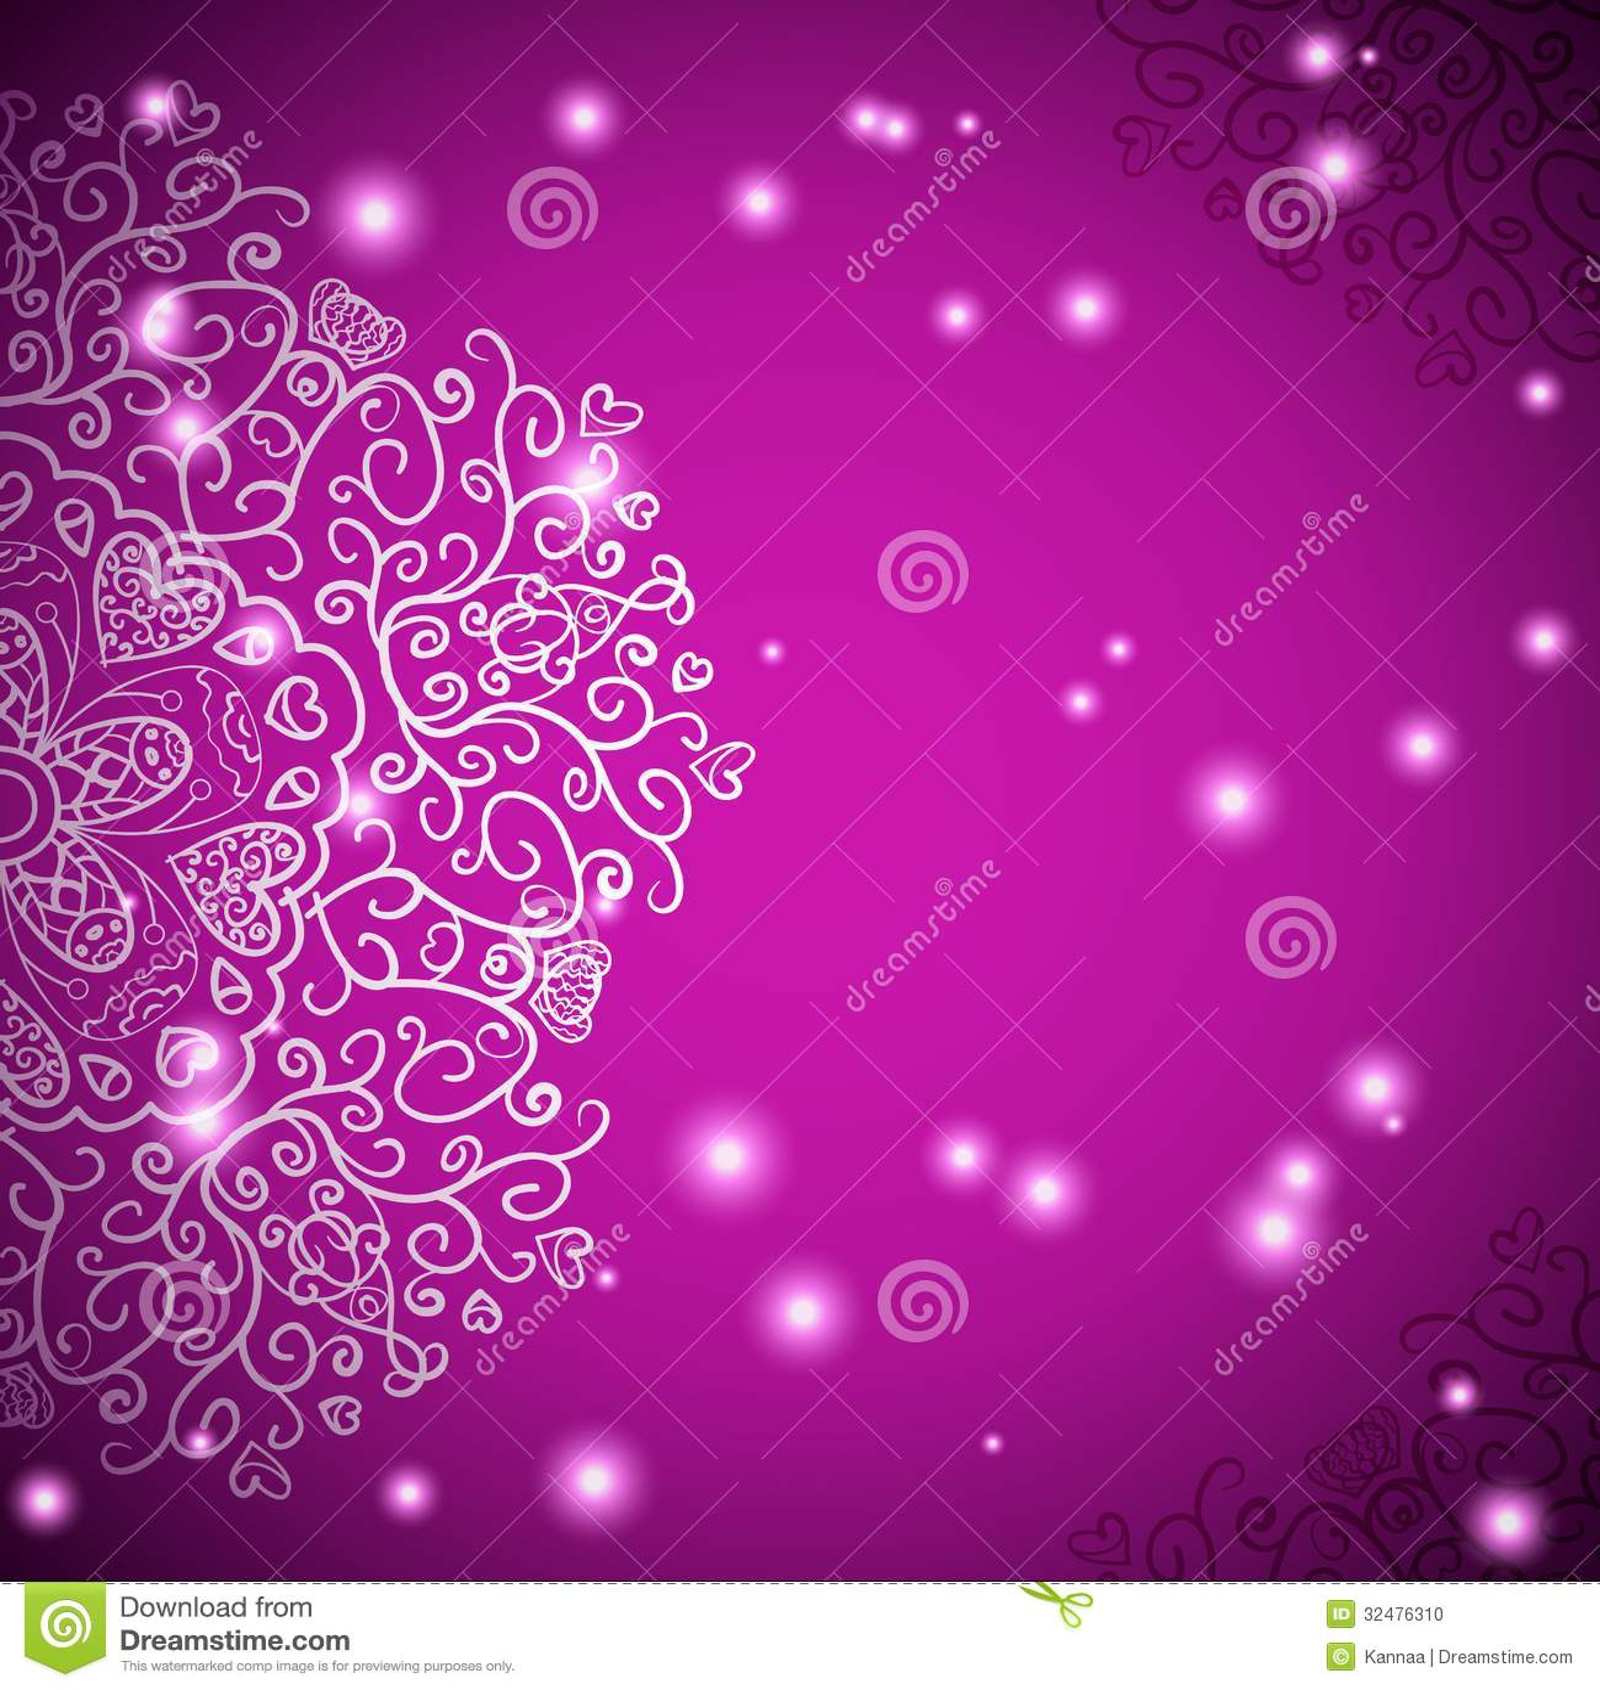 Vector Illustration Web Designs: Retro Antique Ornament Purple Background With Stock Vector